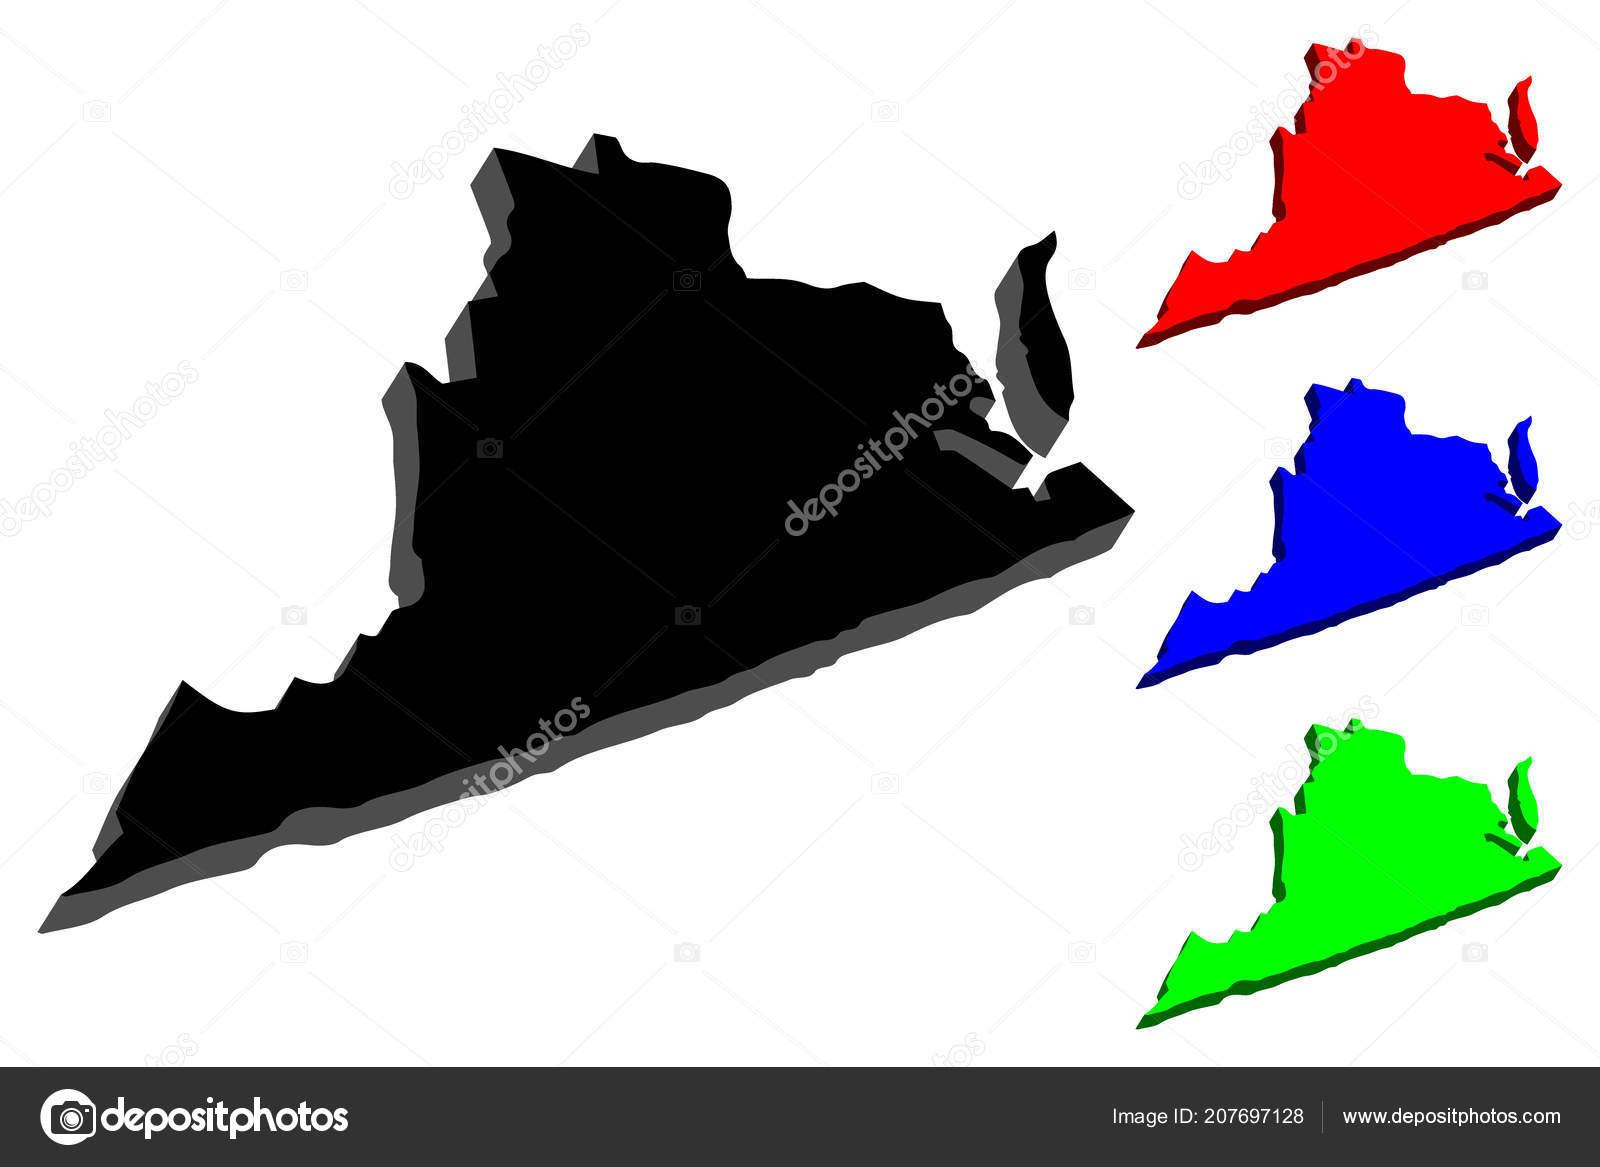 Virginia United States Map.Map Virginia United States America Commonwealth Virginia Black Red